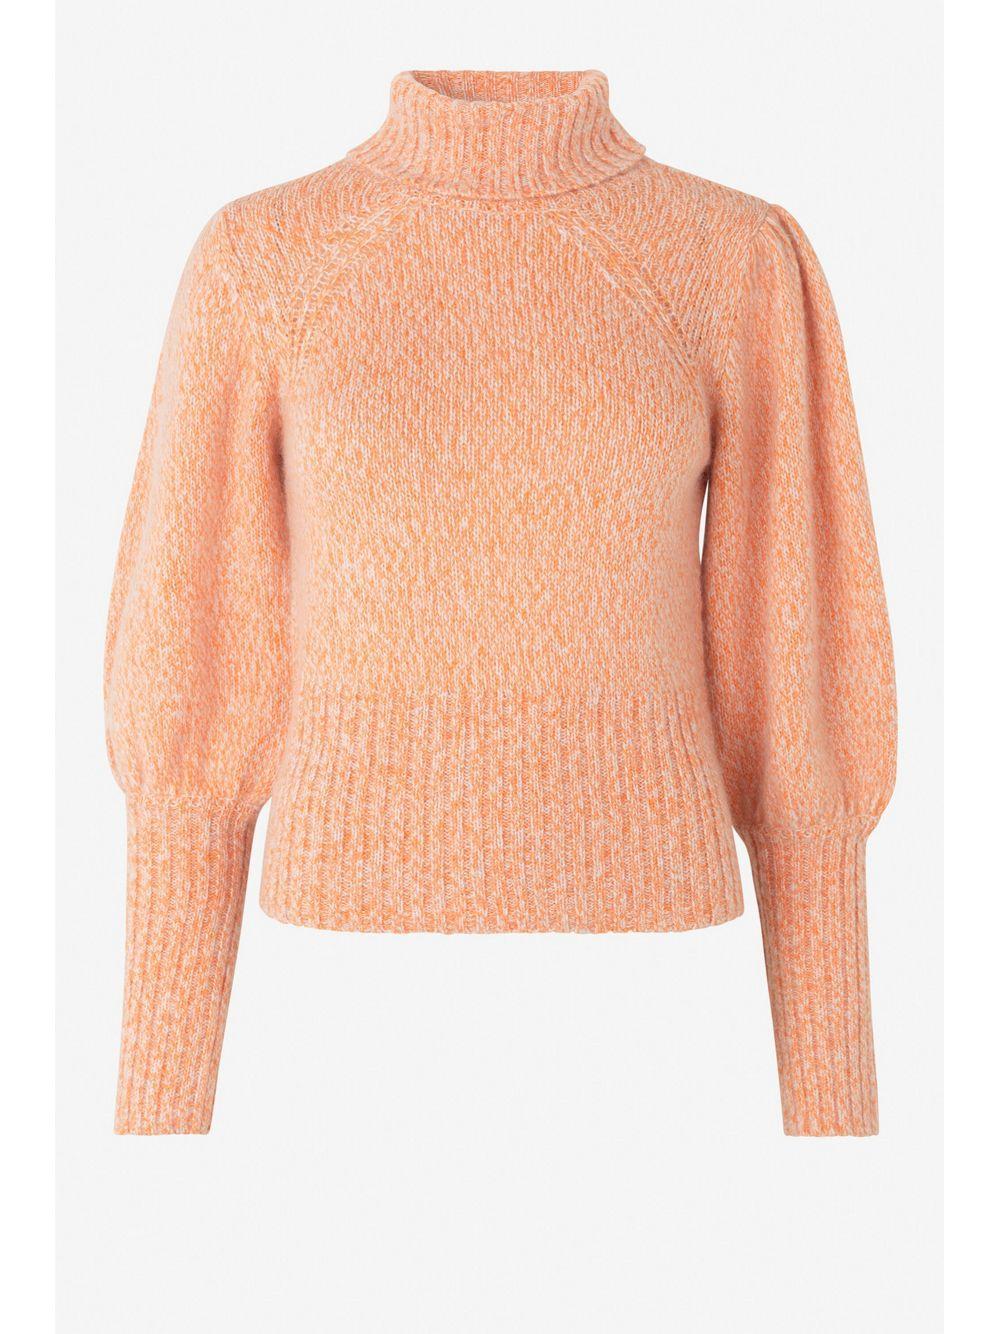 Catarina Sweater Item # 21427